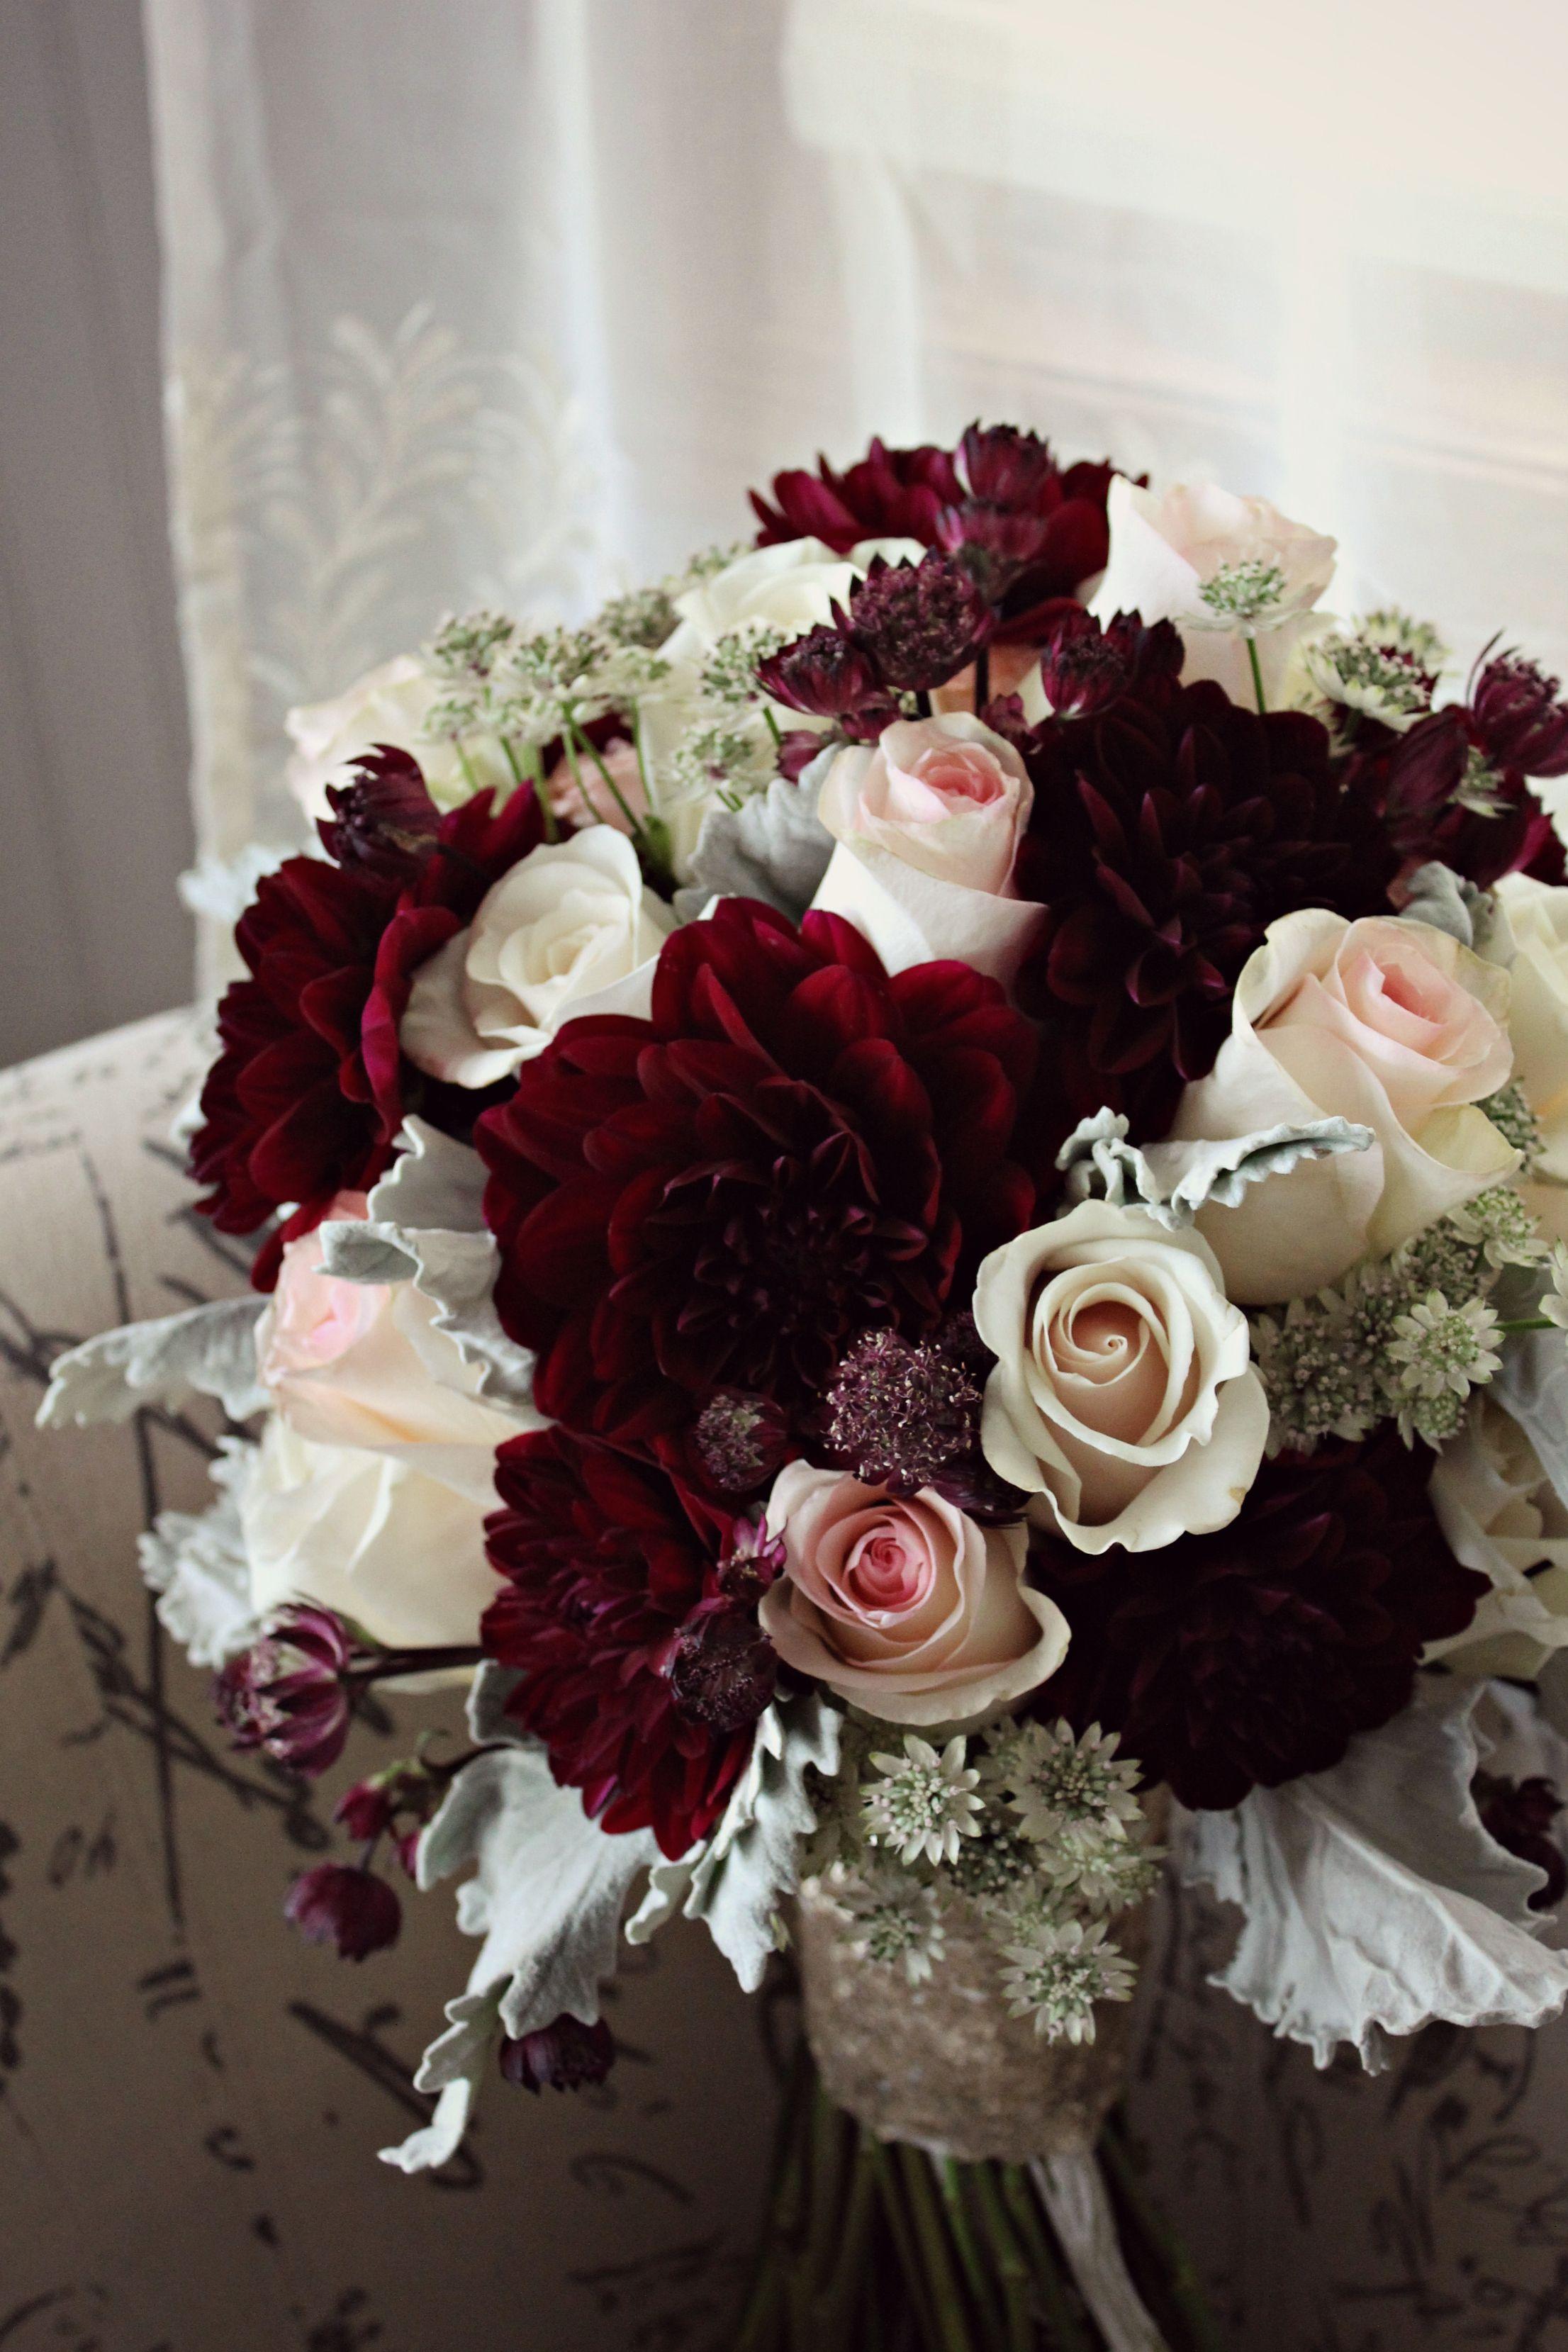 Stunning Burgundy Blush And Champagne Wedding Bouquet Burgundy Dahlias Blush Roses Cre Wedding Bouquet Champagne Rose Wedding Bouquet Blush Wedding Flowers